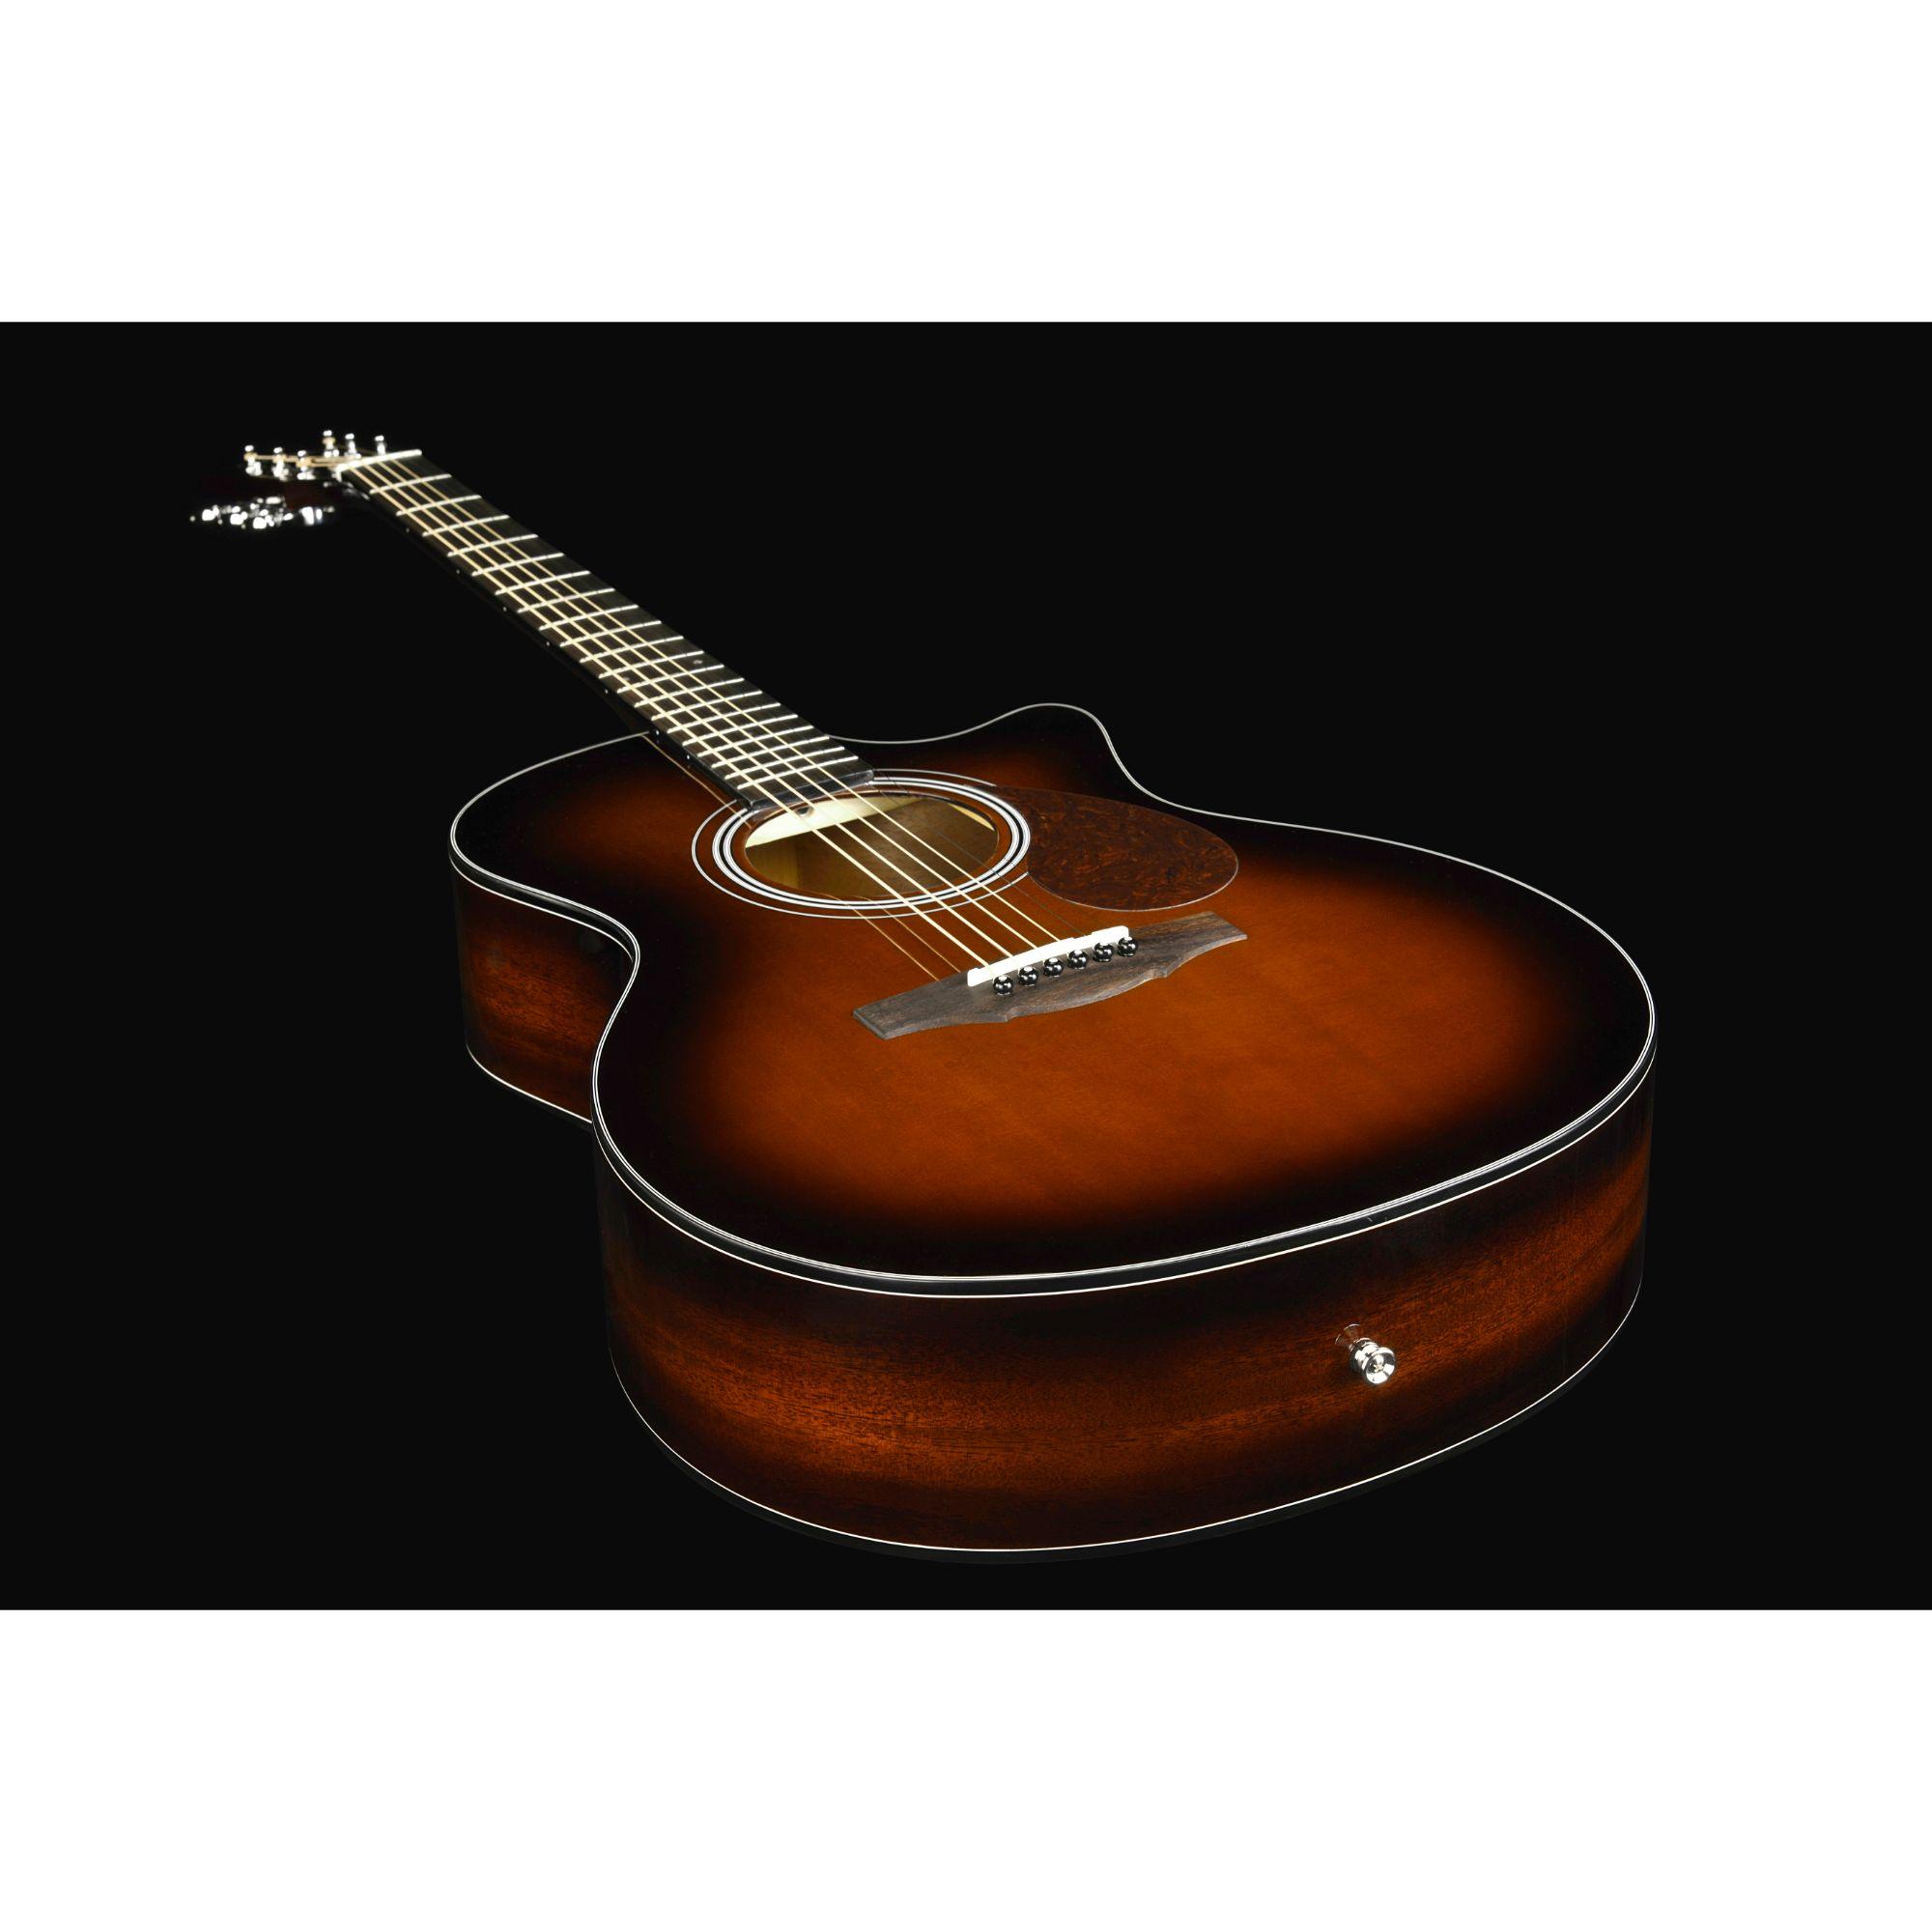 Kepma F0E GA TransAcoustic Guitar - Cherry Burst